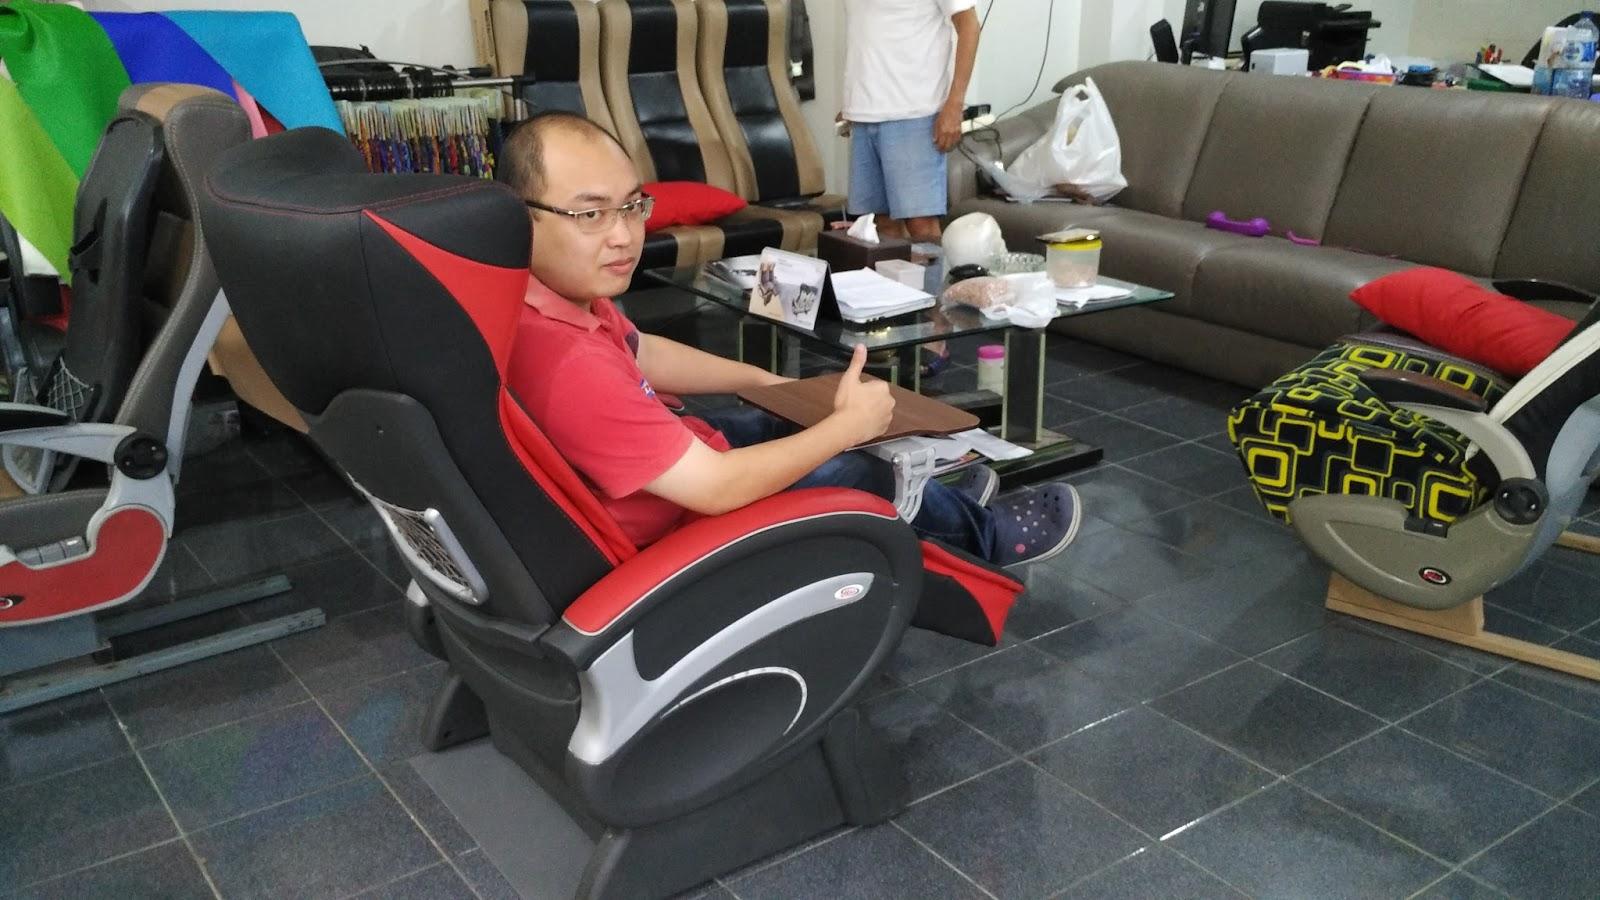 Jual Aksesoris Spare Part Komponen Bus Captain Seat For